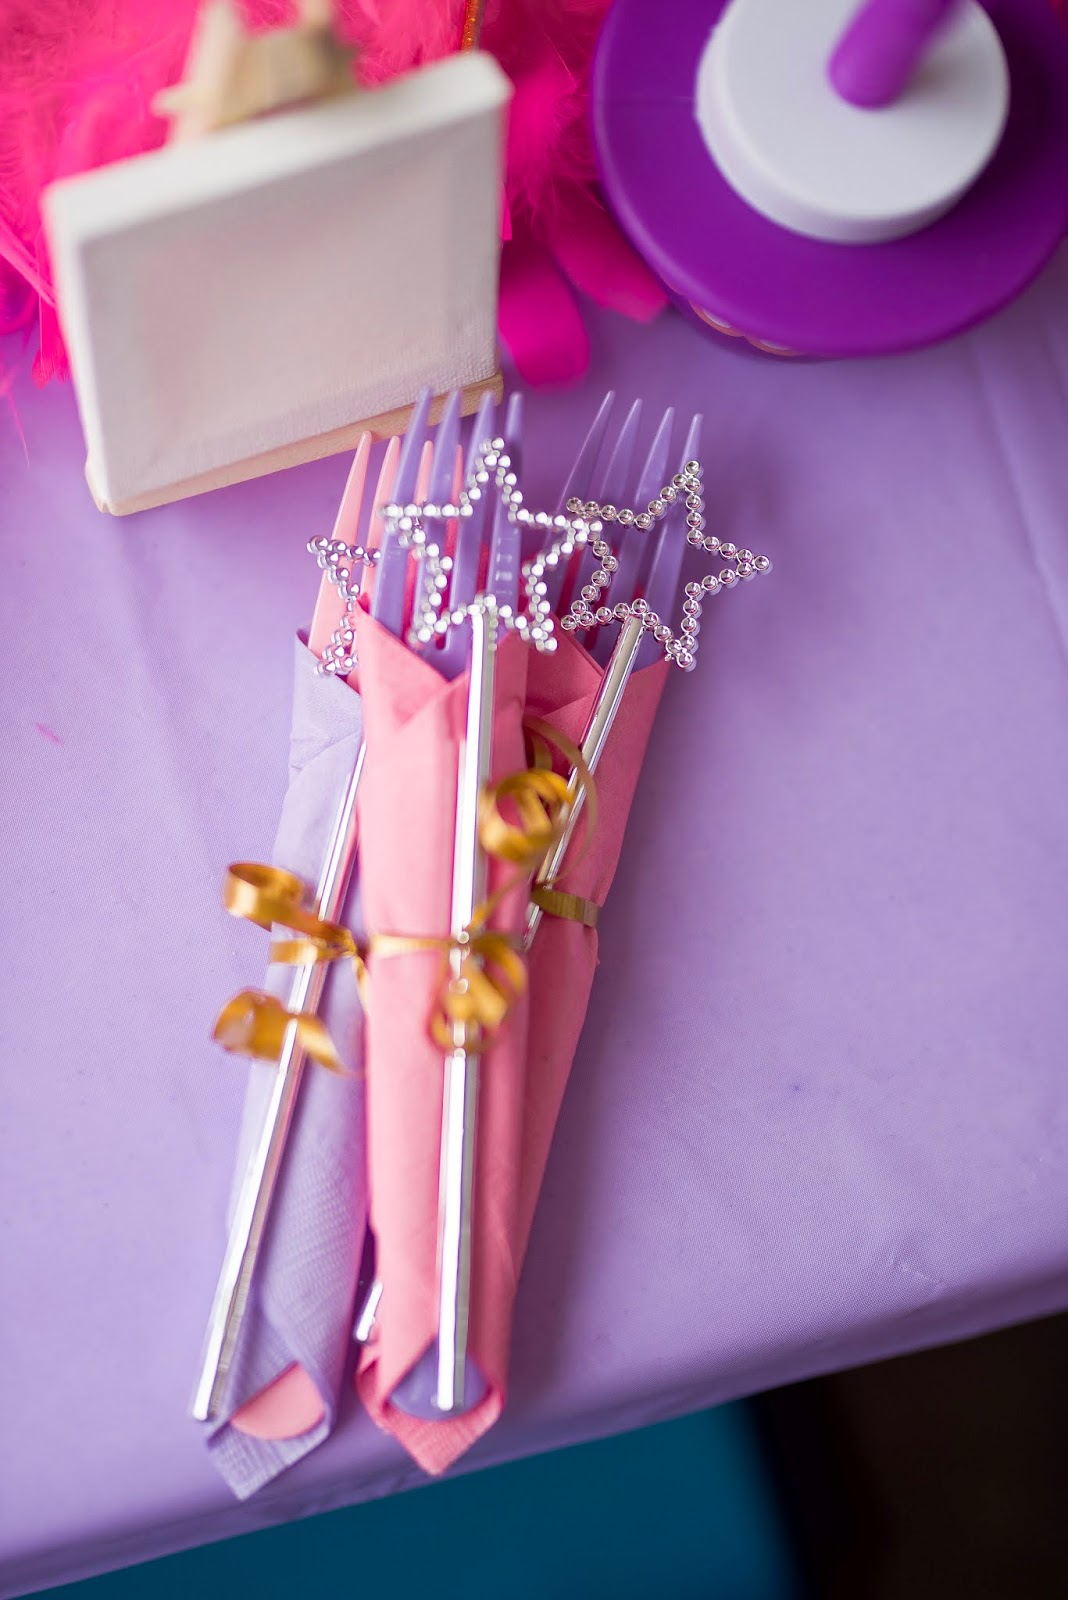 Madeline's Fancy Nancy, Paris, Butterfly Themed 4th Birthday Party - Something Delightful Blog #partyplanning #kidsbirthdayparty #birthdaypartyideas #parisparty #butterflyparty #fancynancy #fancynancyparty #fourthbirthdayideas